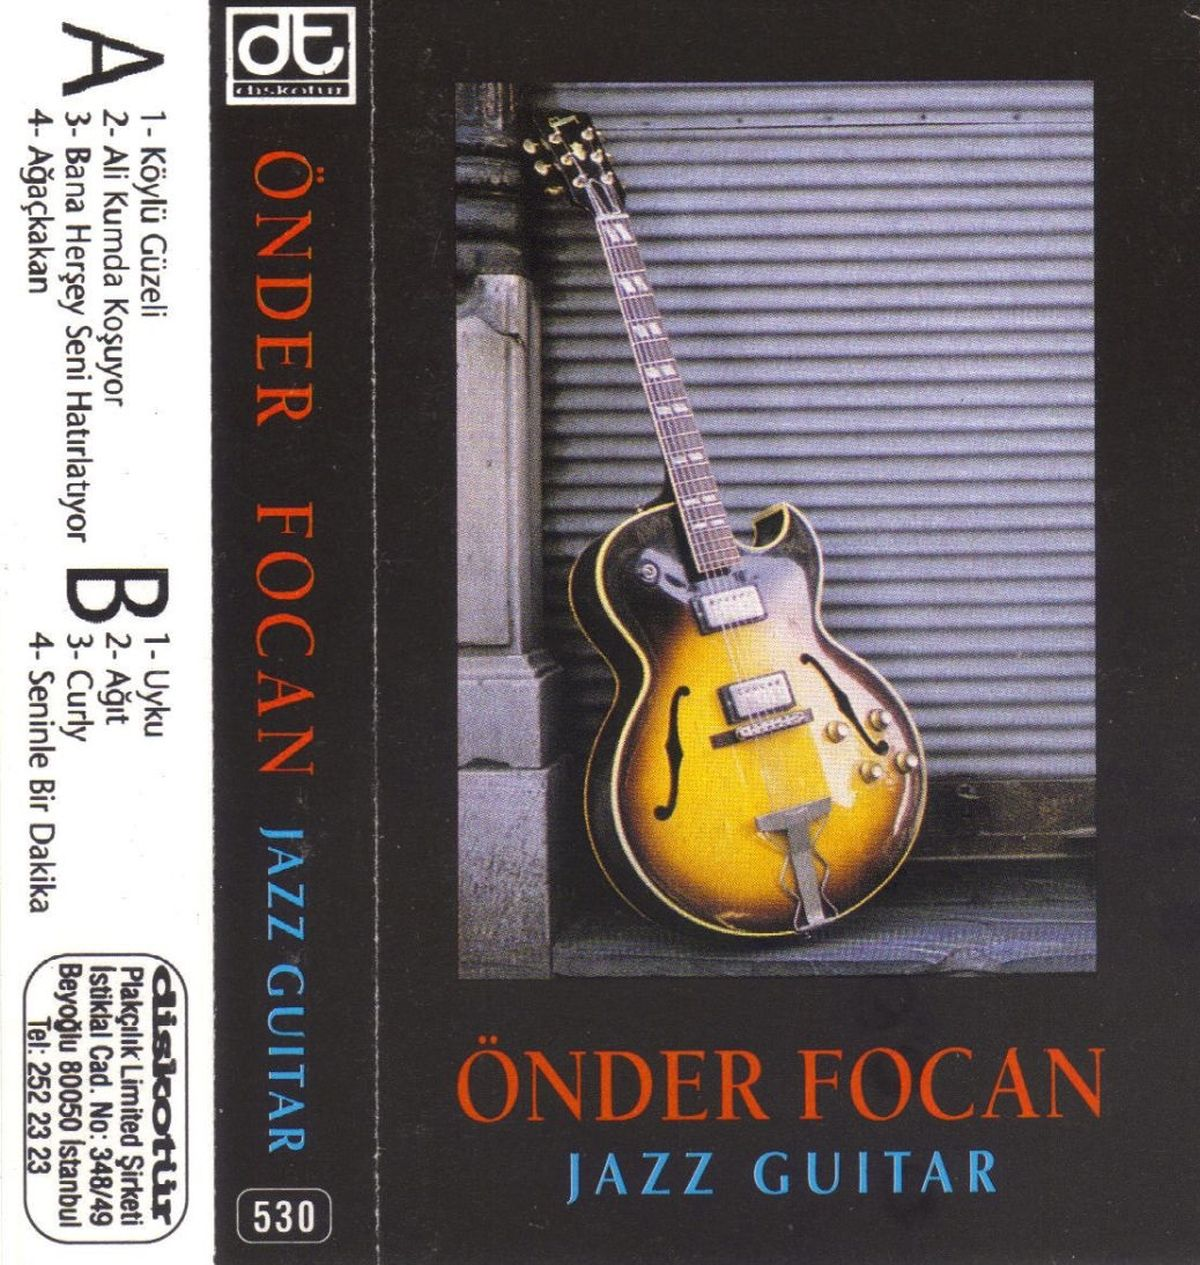 0139-onder-focan-1994-jazz-guitar-albumu-diskotur-plakcilik